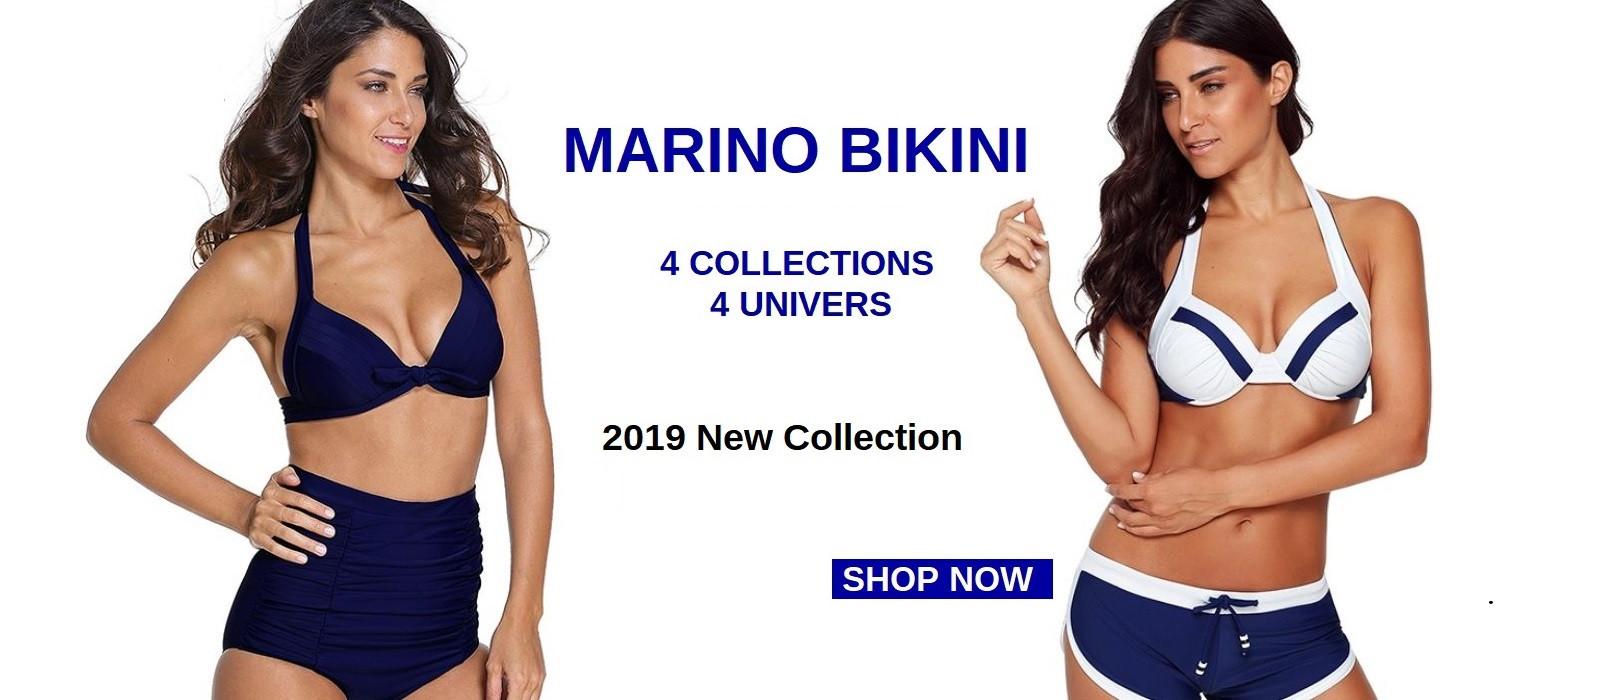 Marino bikini